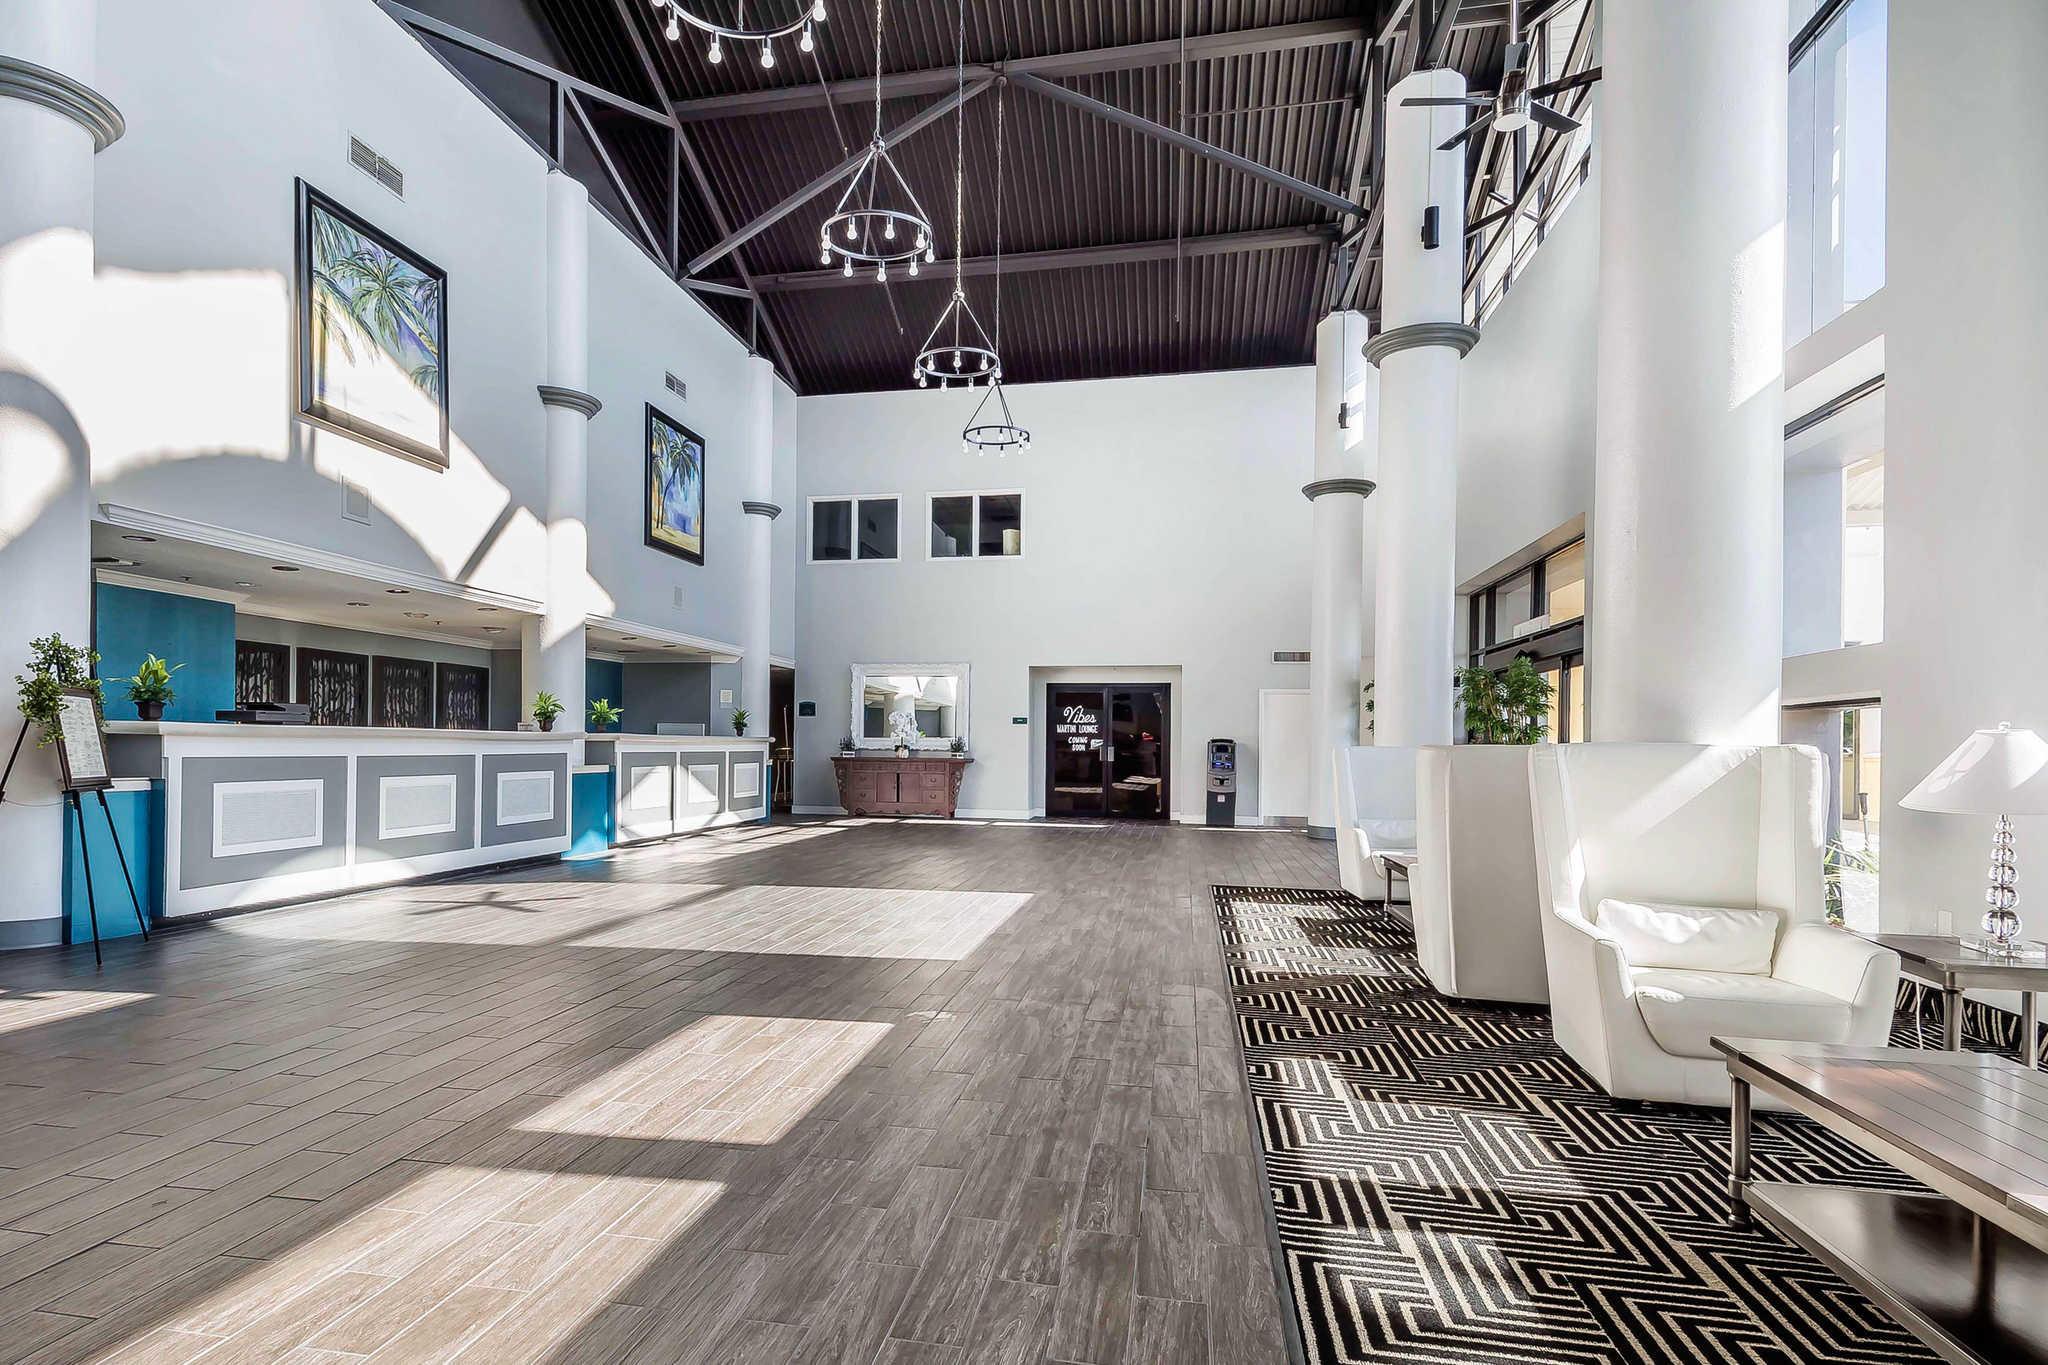 clarion hotel orlando international airport in orlando fl. Black Bedroom Furniture Sets. Home Design Ideas